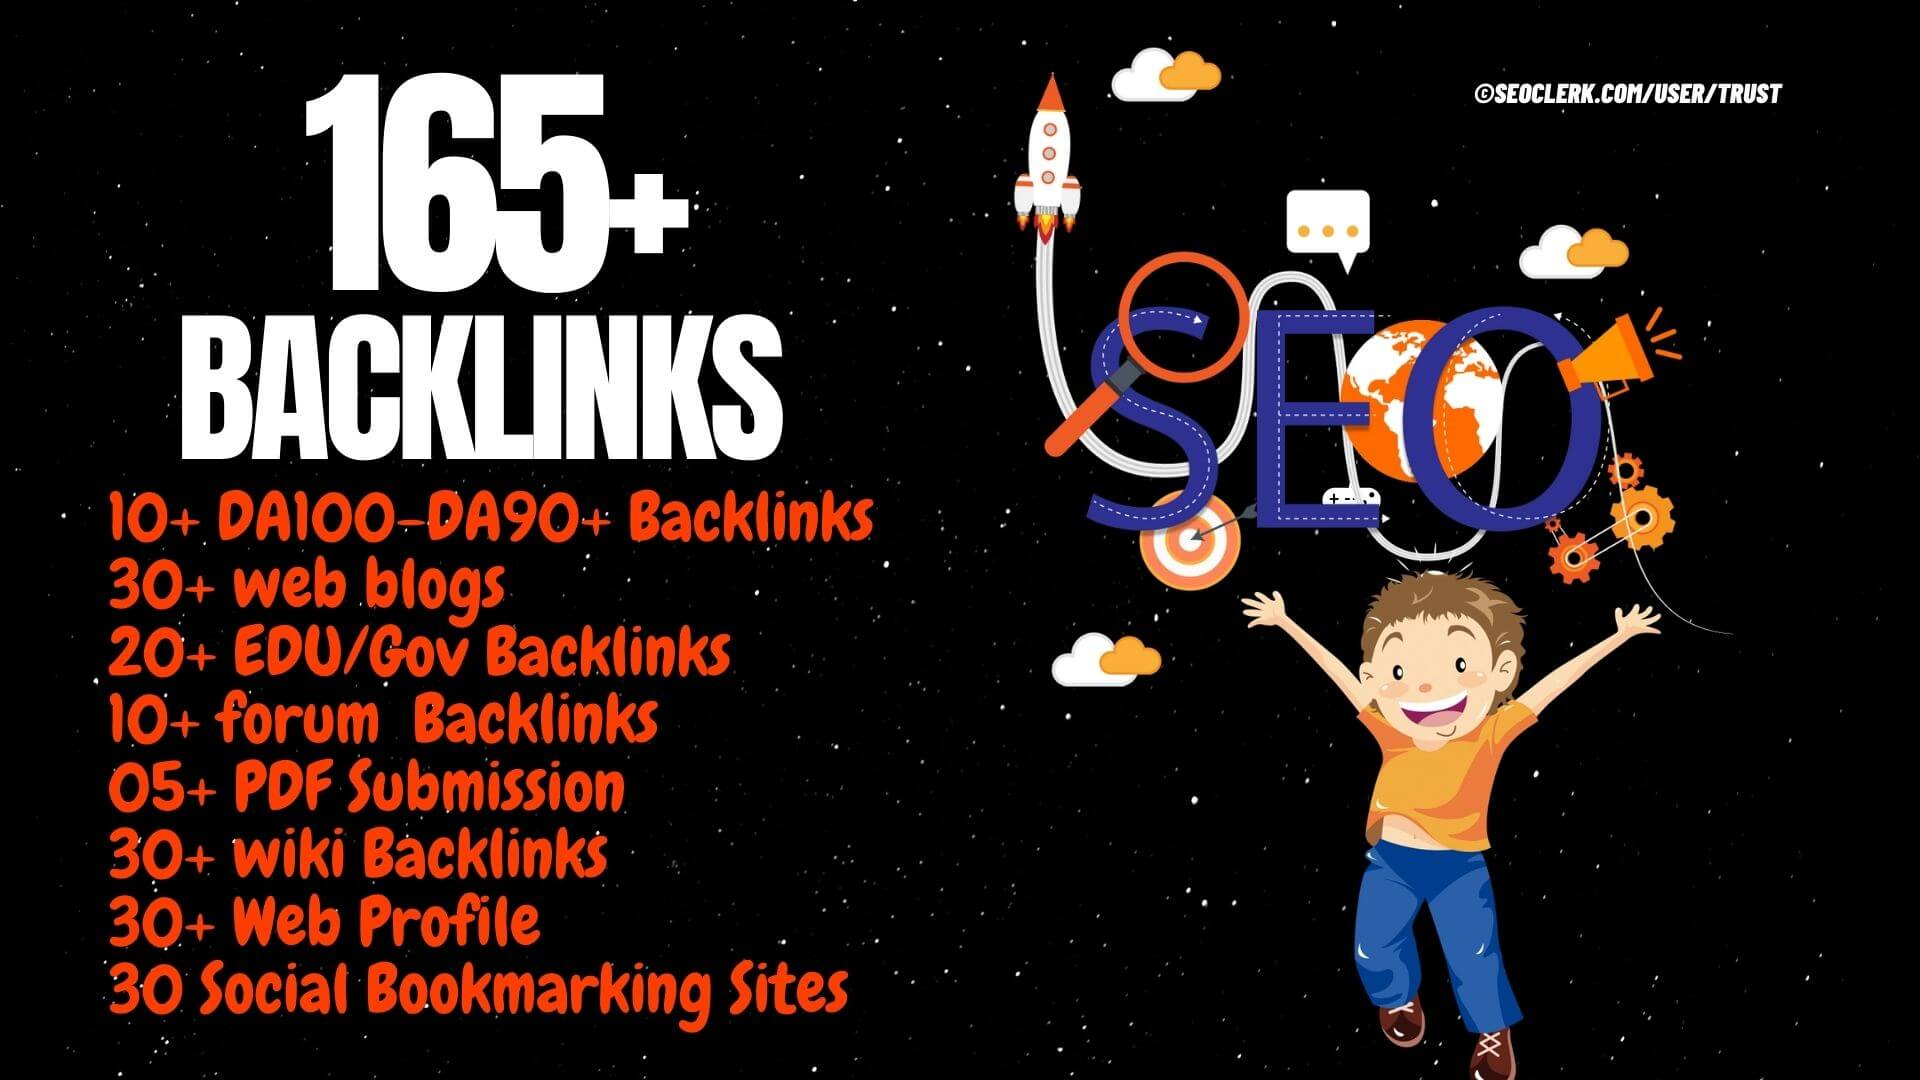 165 Backlinks from DA90+ PR9, 60 Web 2.0 , 20 Edu/Gov, 30 Wiki, 30 Web, 30 Sbookmar & 10 Forum